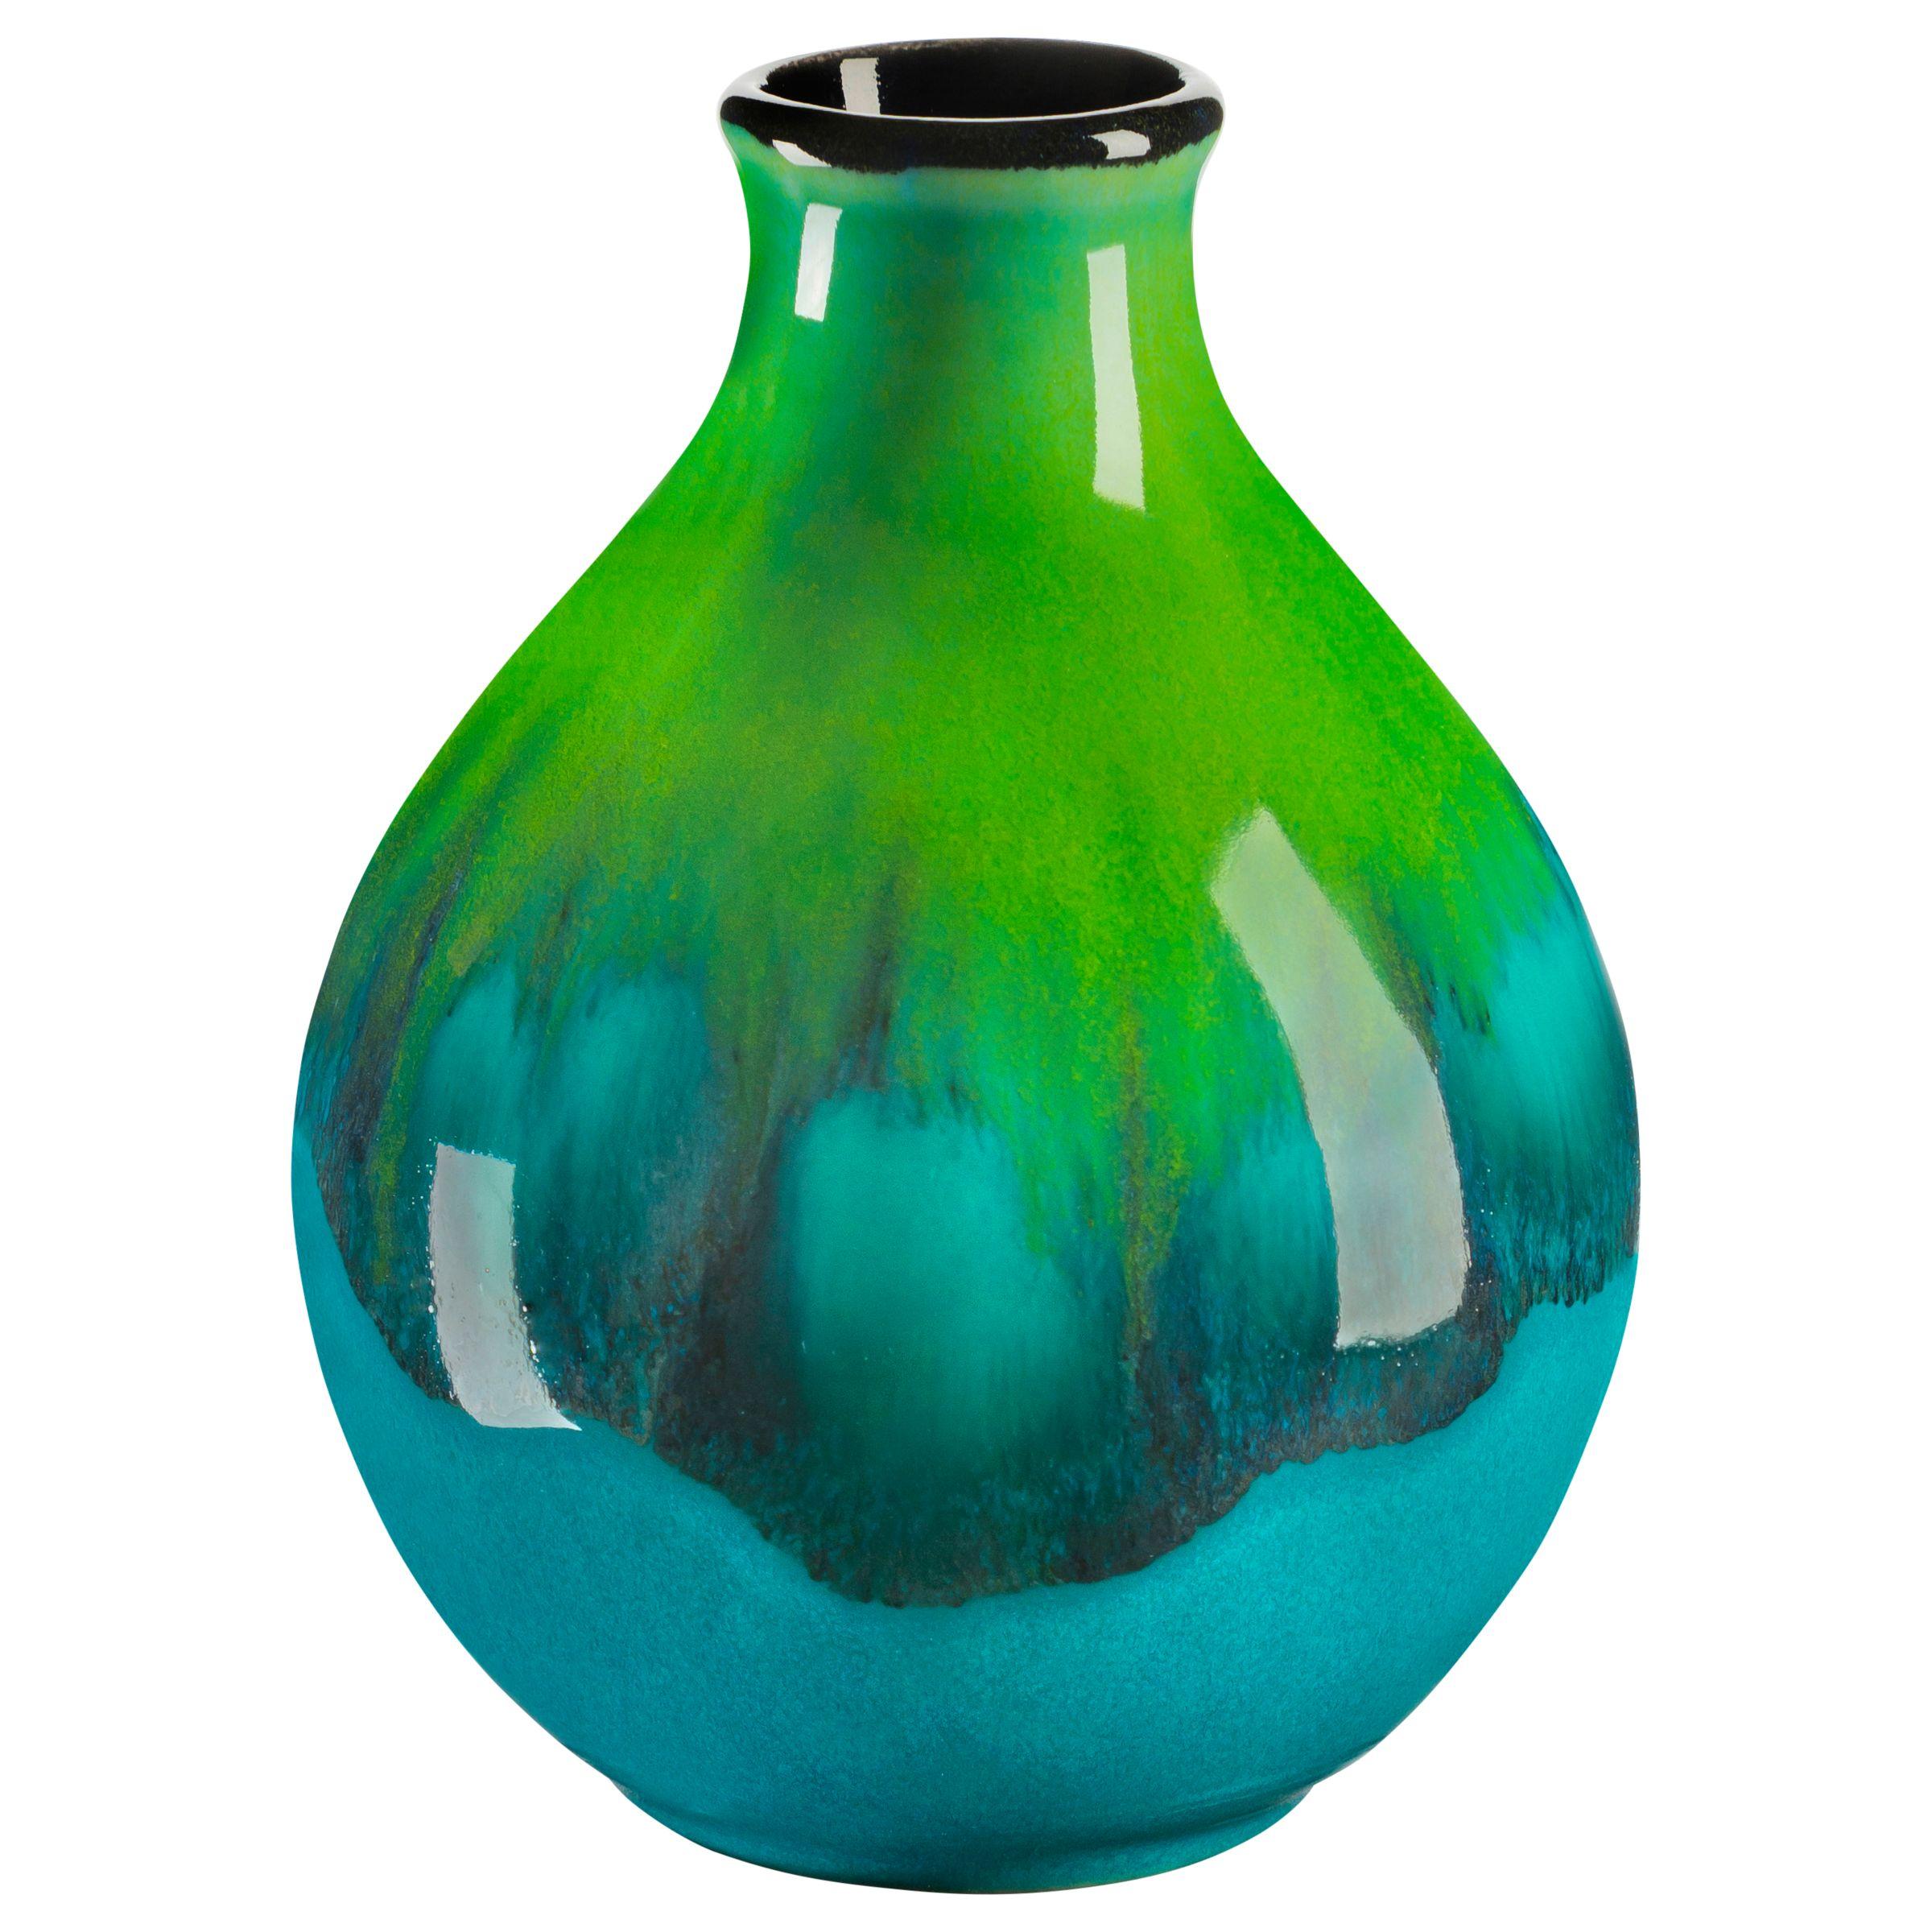 Poole Pottery Poole Pottery Tallulah Bud Vase, H12cm